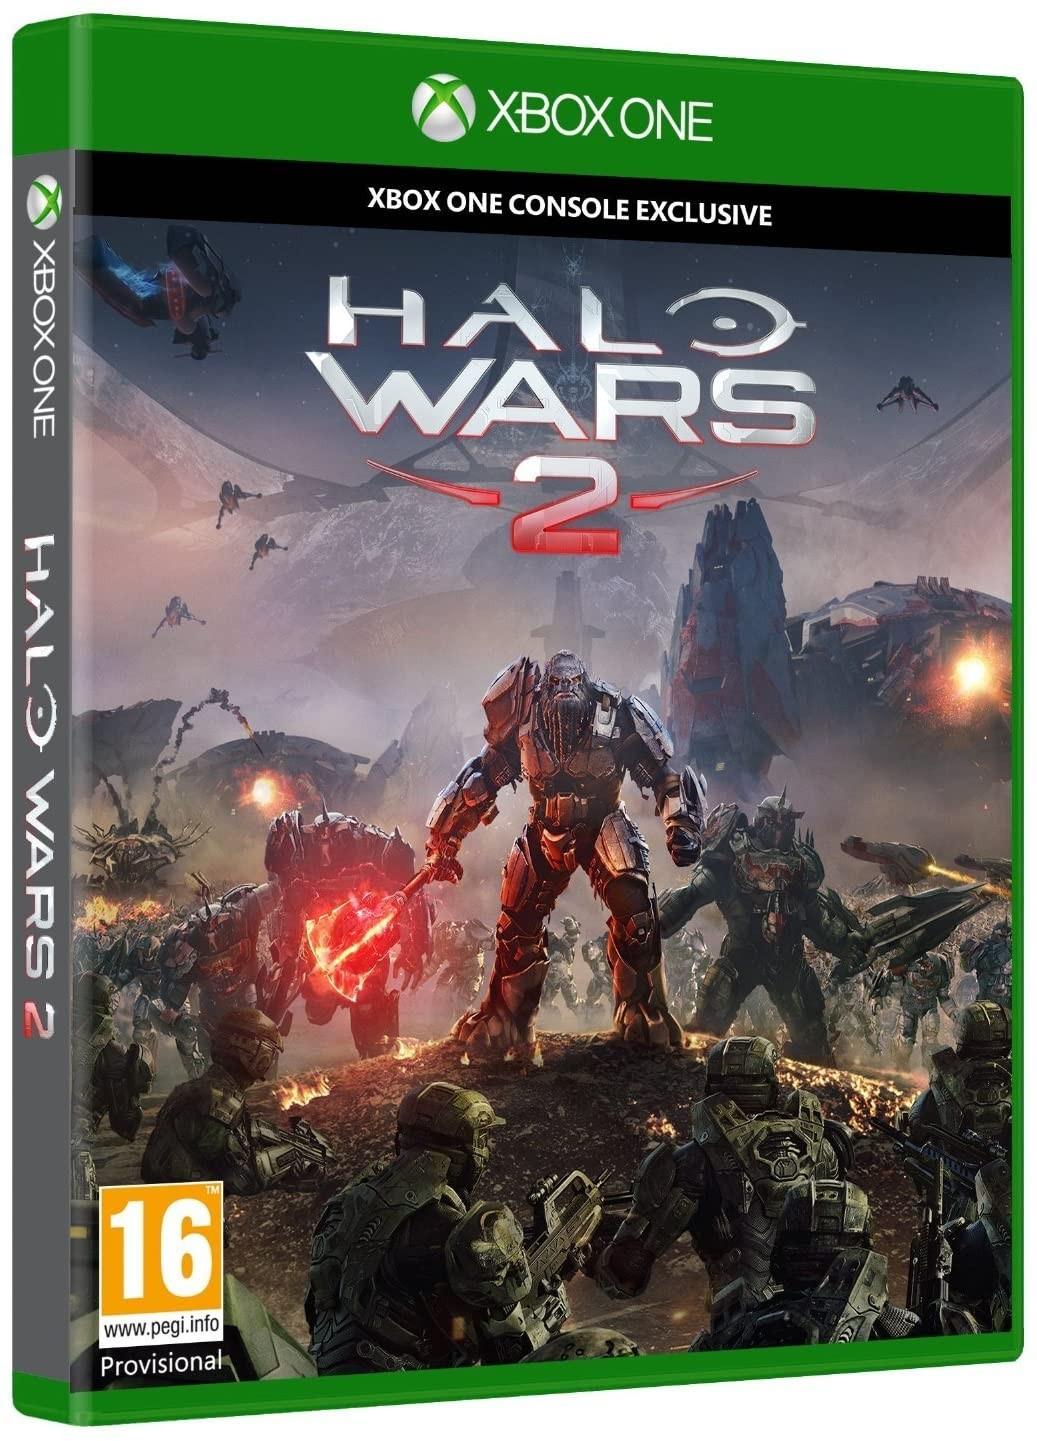 Halo Wars 2 XONE